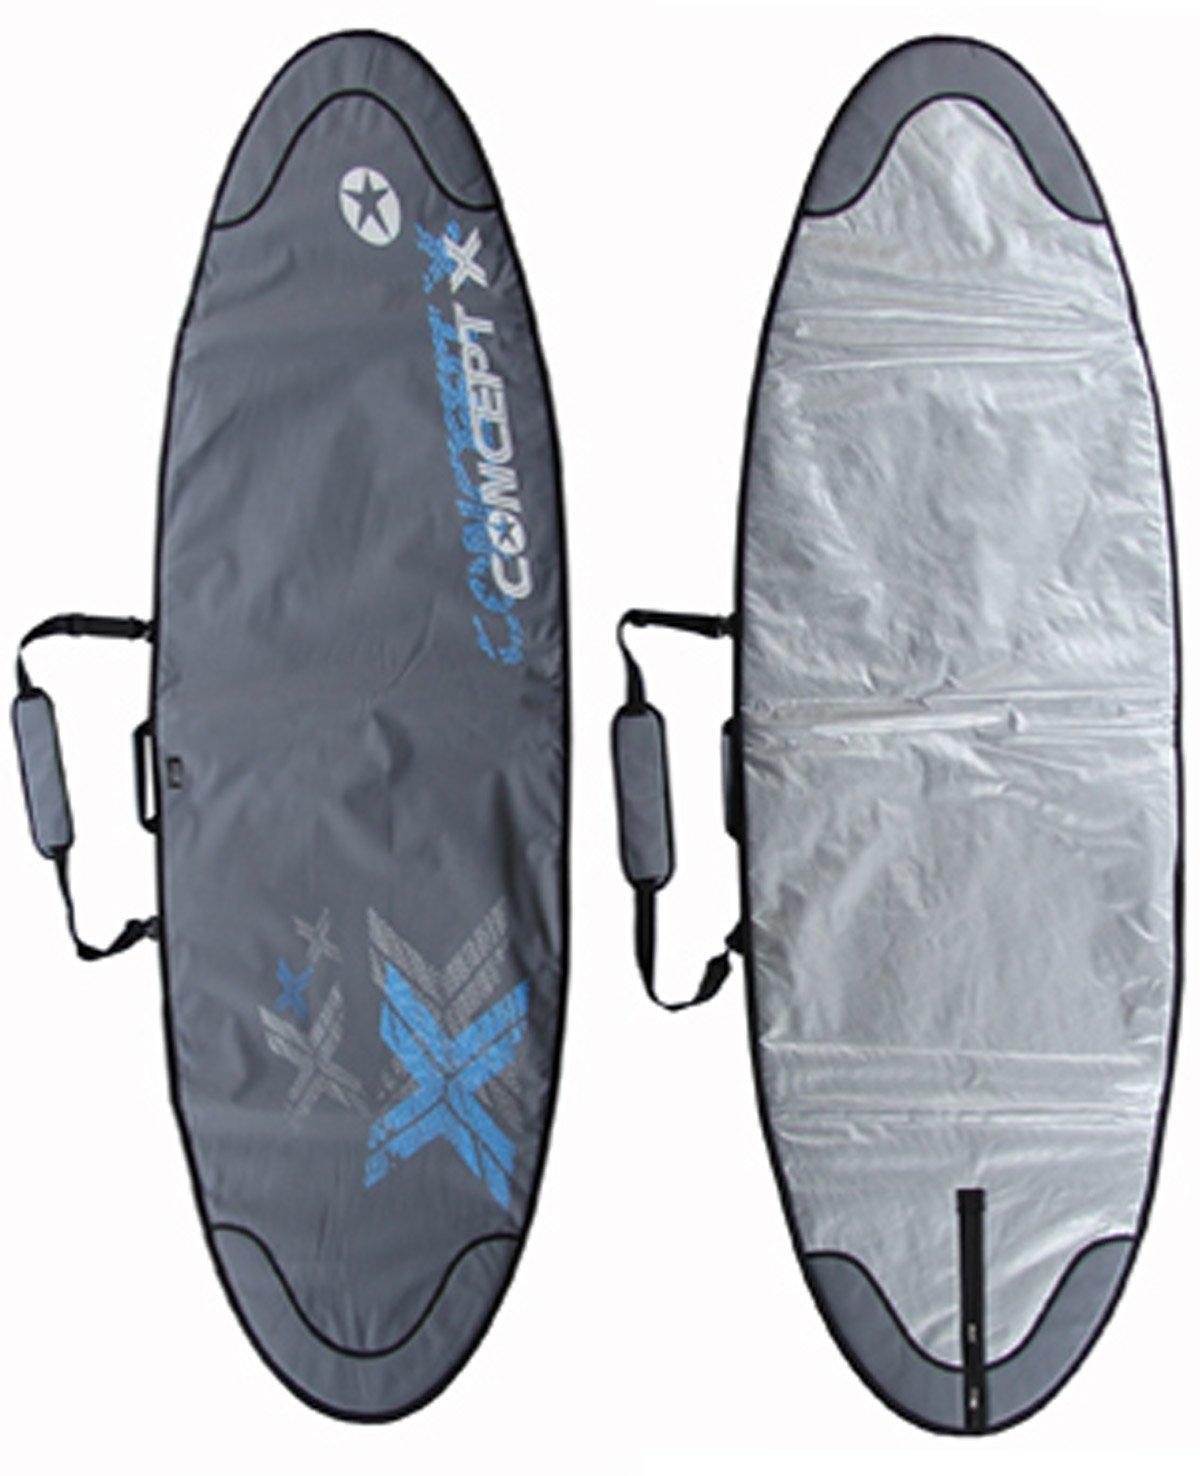 Concept X Boardbag Rocket Twinser